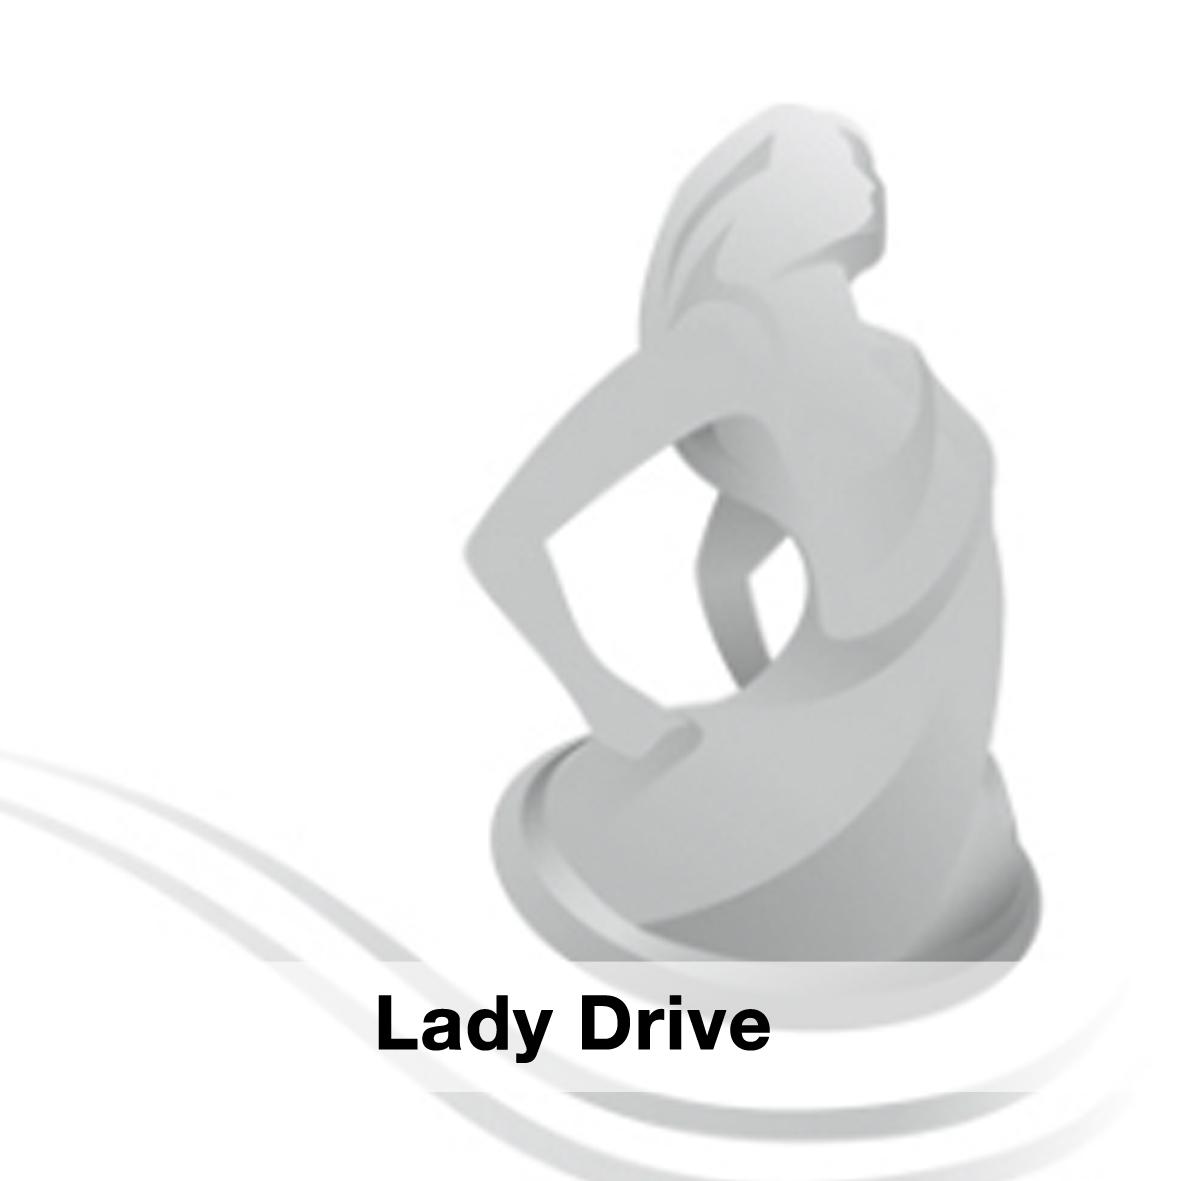 lady drive.jpg